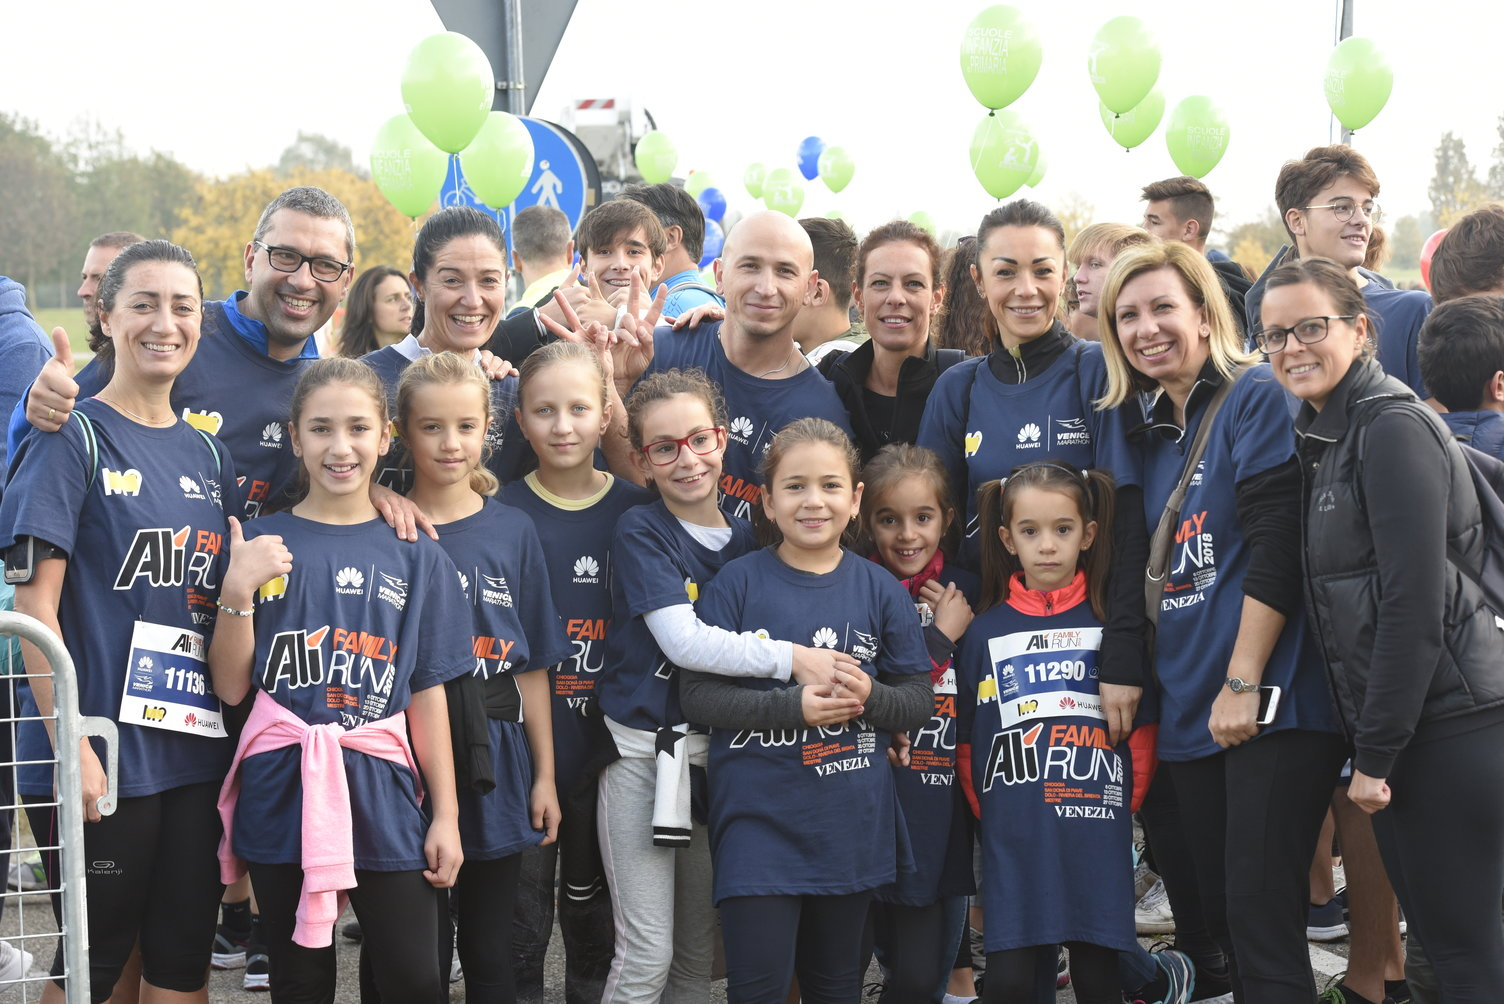 Alì Family Run: 3,2,1...si parte!